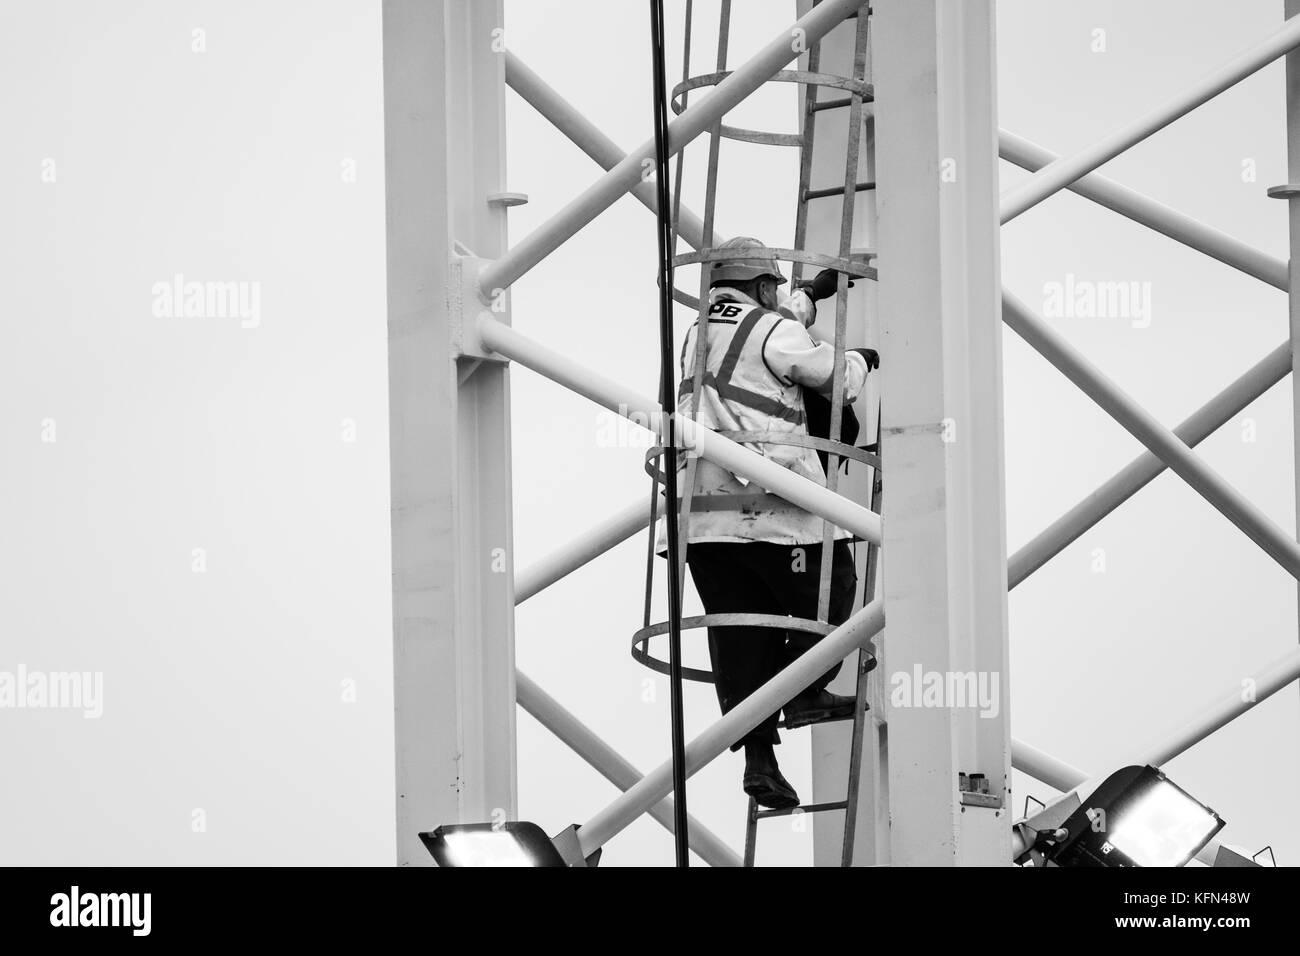 Construction in progress, Birmingham, U.k. - Stock Image